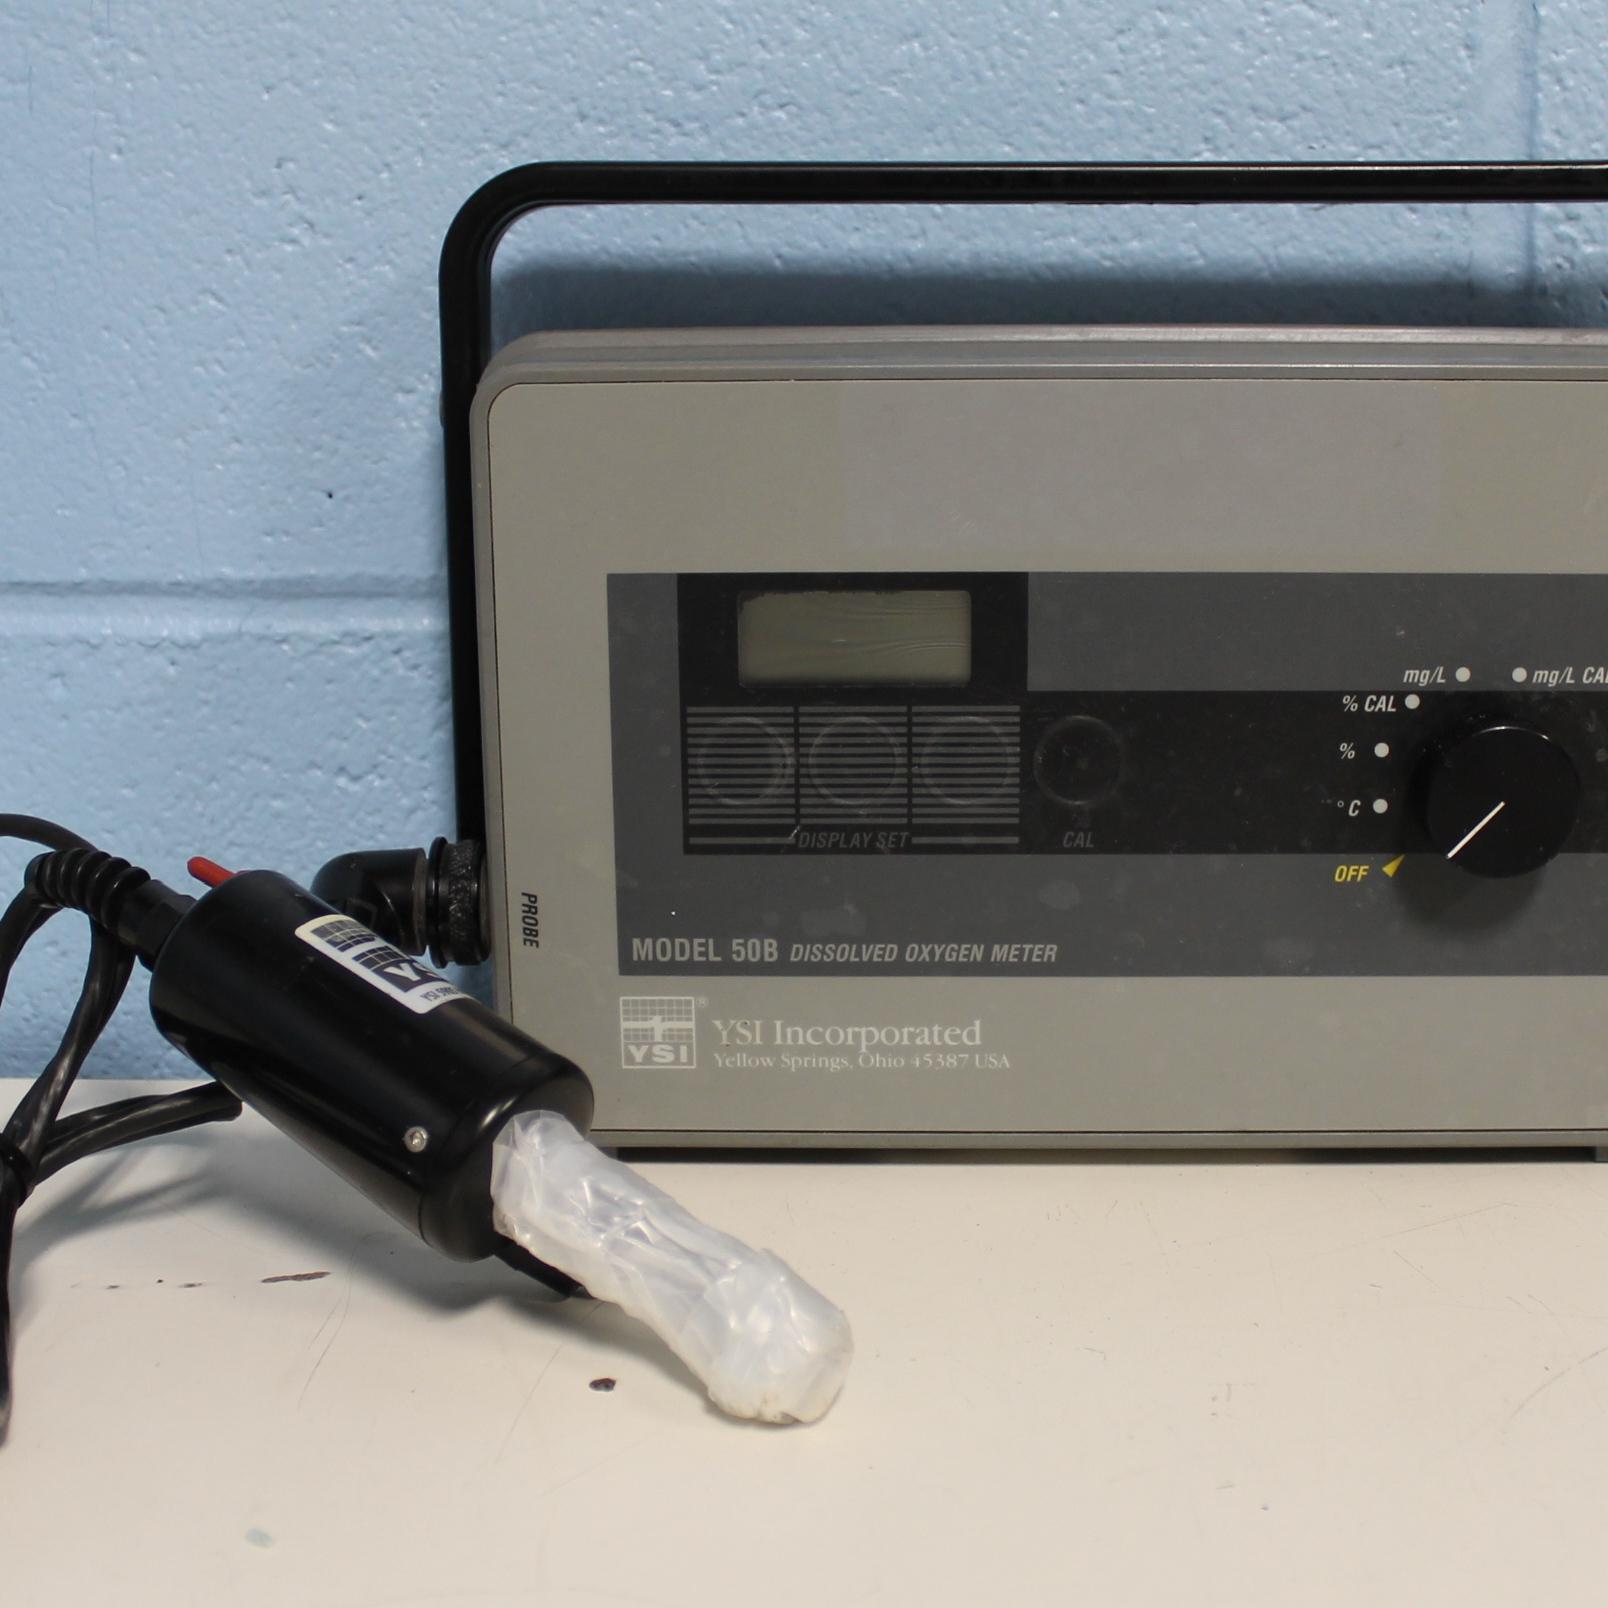 YSI 50B Dissolved Oxygen Meter Image